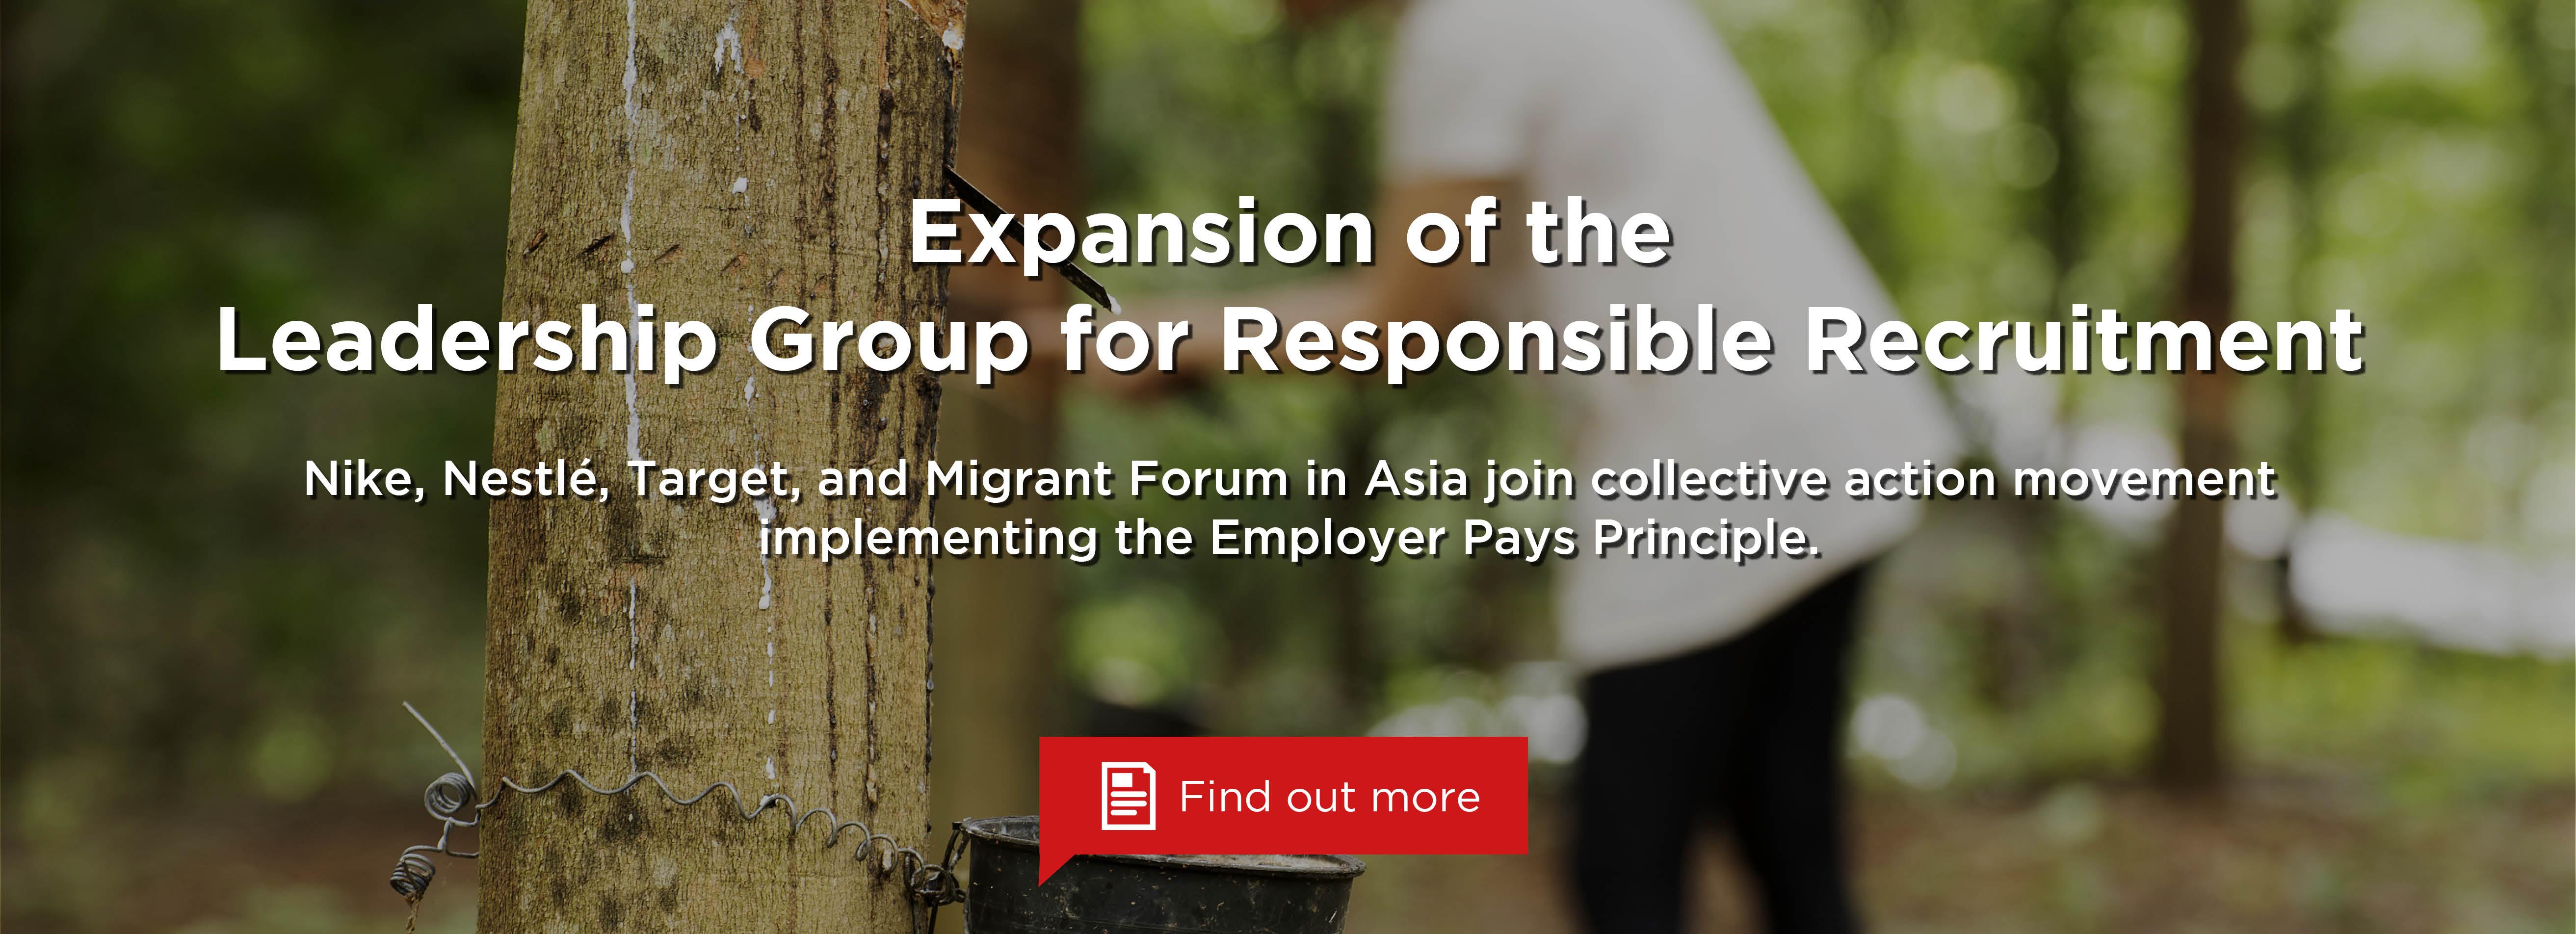 Nike, Nestle, Target, MFA Join Leadership Group for Responsible Recruitment